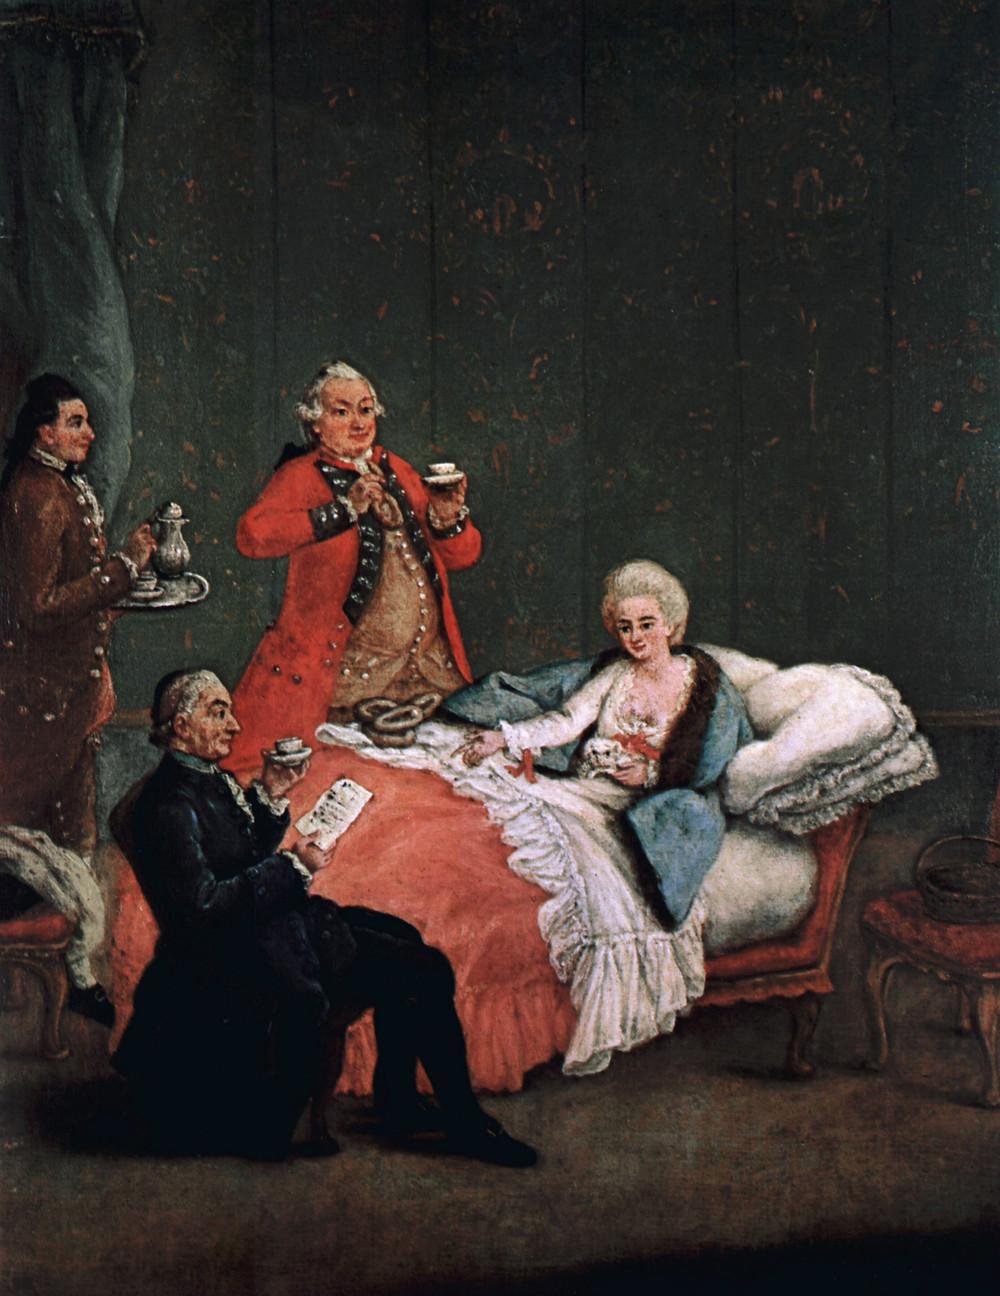 Pietro Longhi, The Morning Chocolate, Venice, 1775-1780